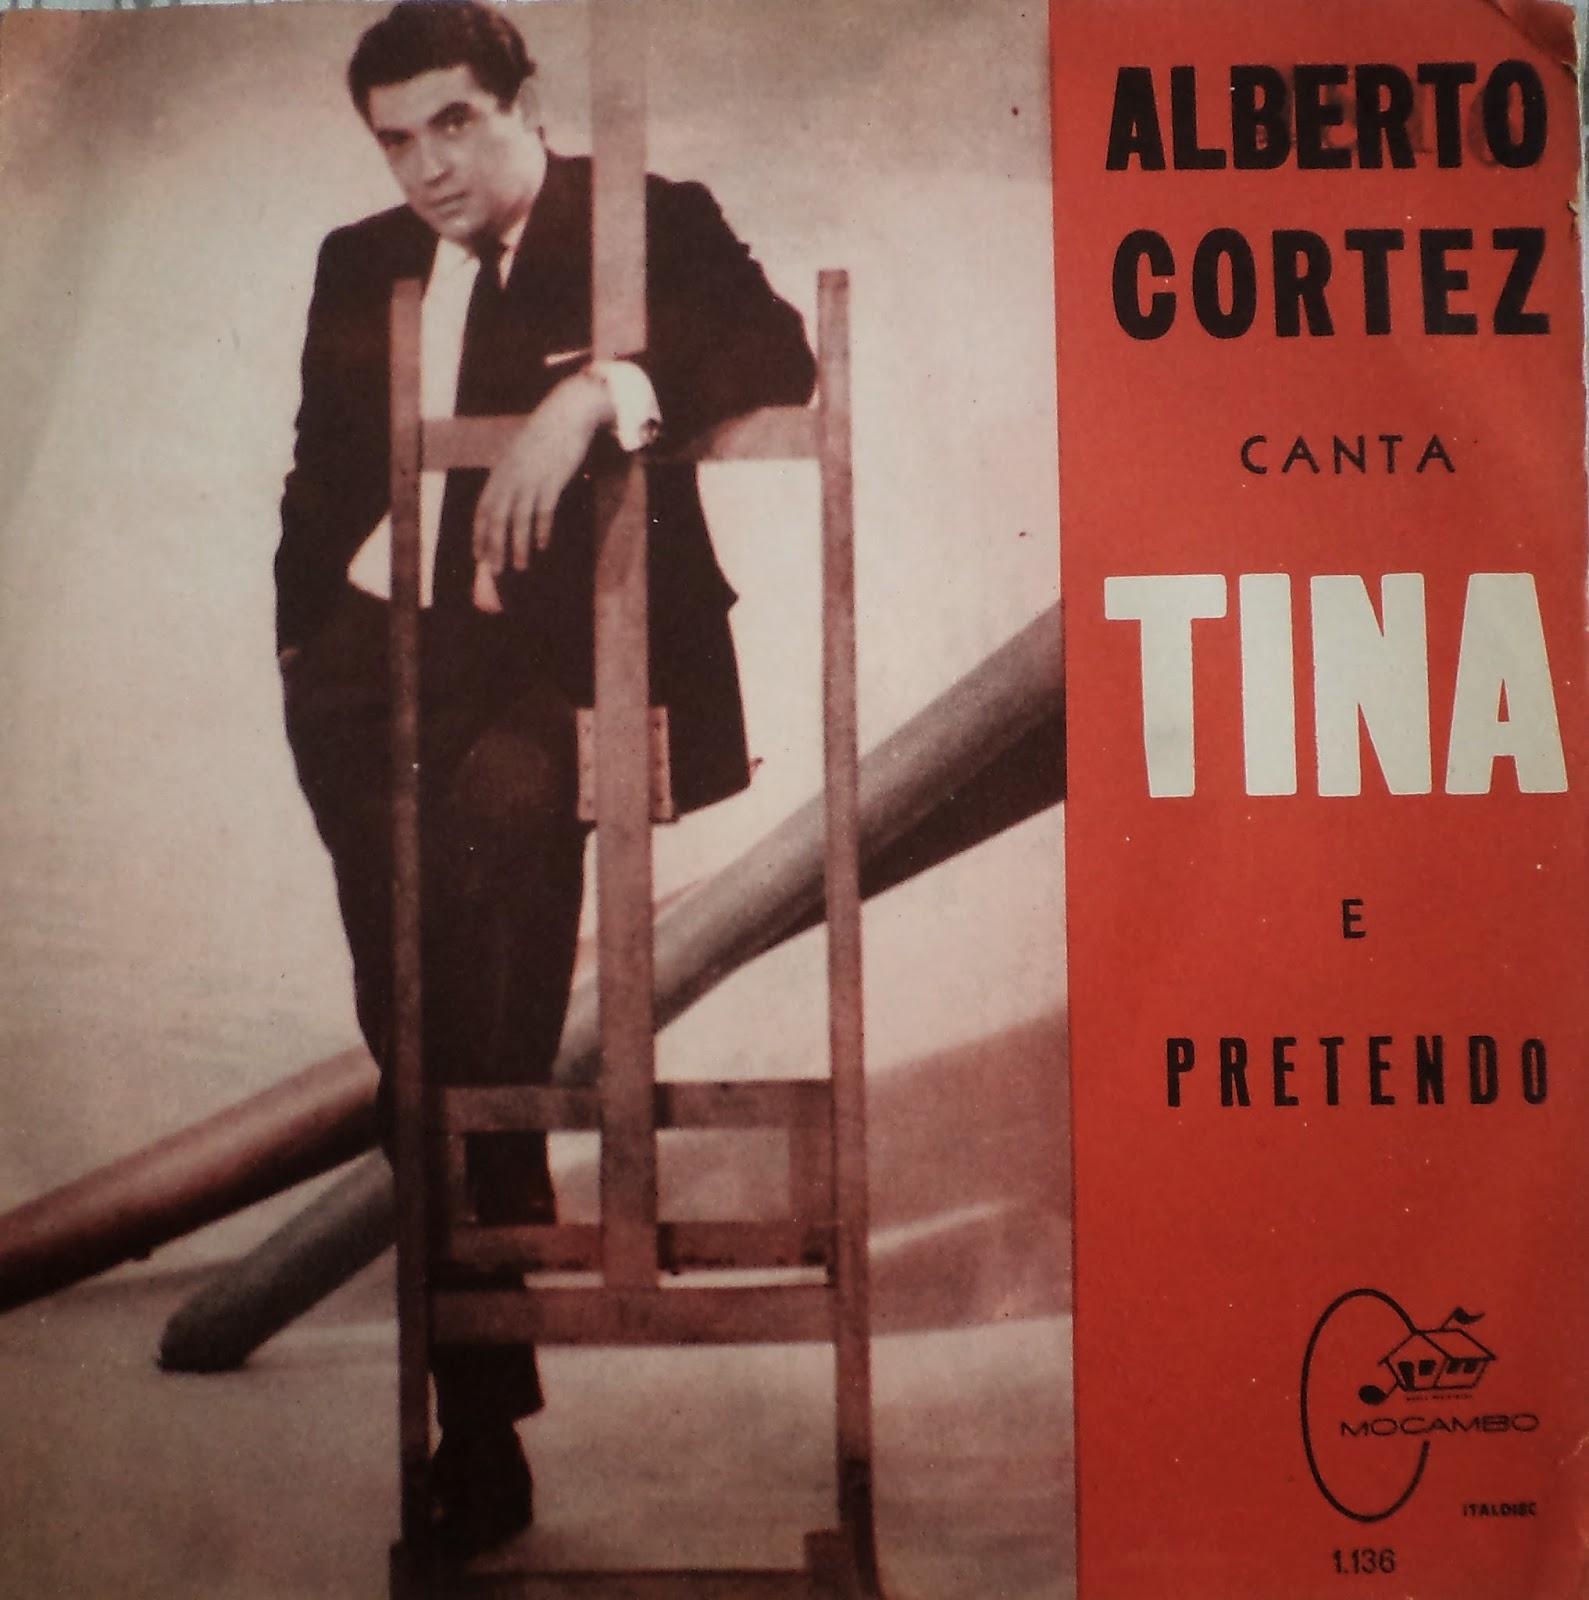 M o c a m b o r o z e n b l i t brazilian record labels alberto cortez 1136 an argentine singer sings in italian for italdisc fandeluxe Choice Image